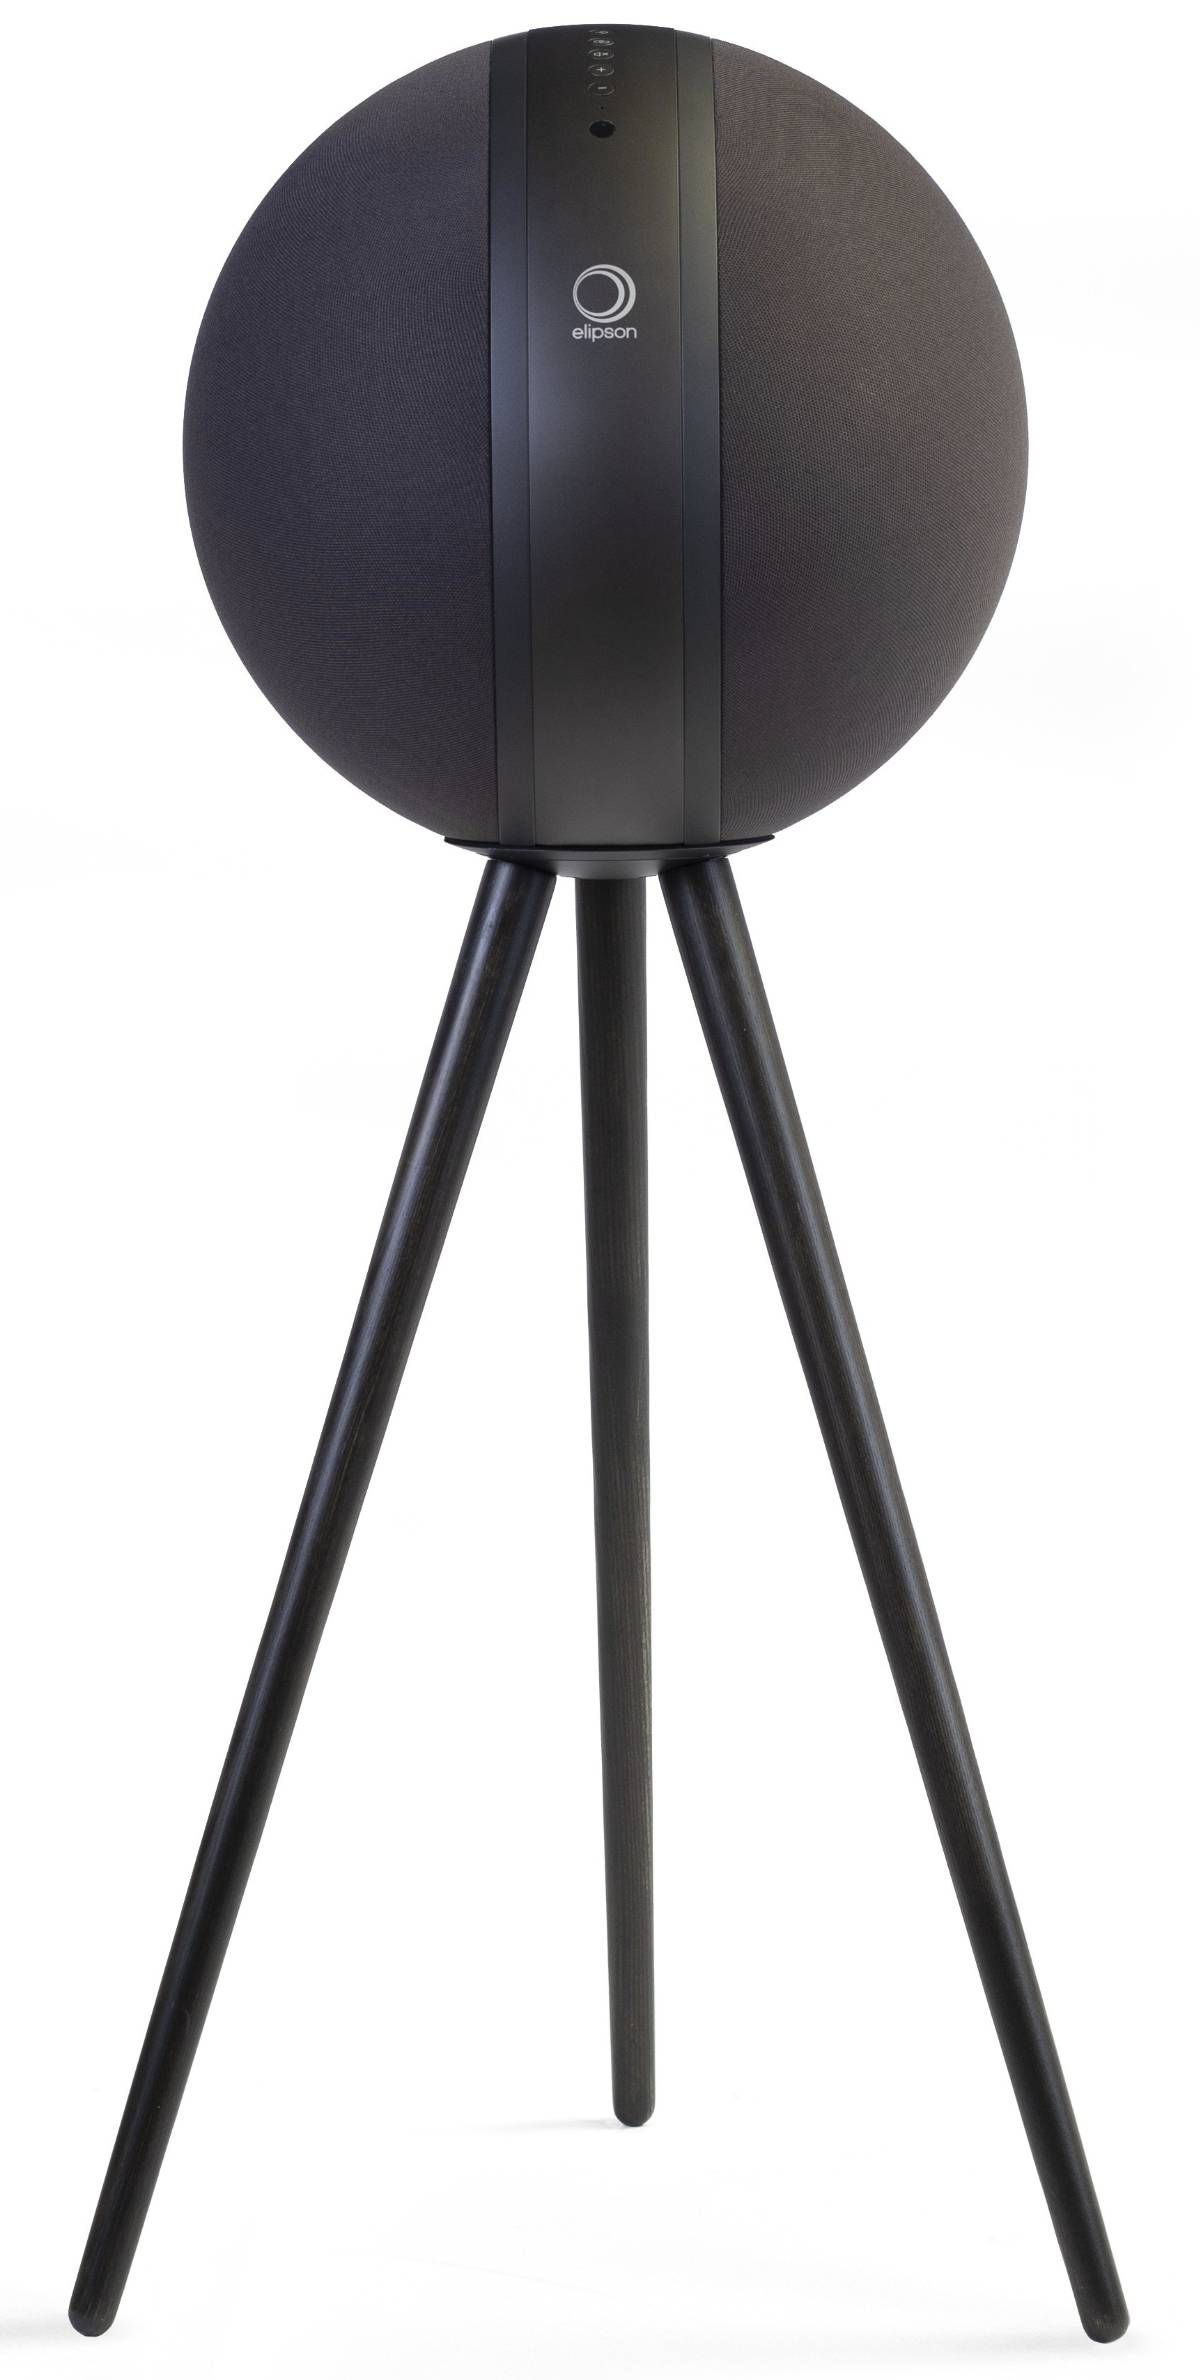 W35 Speakers From Elipson Audio, Box